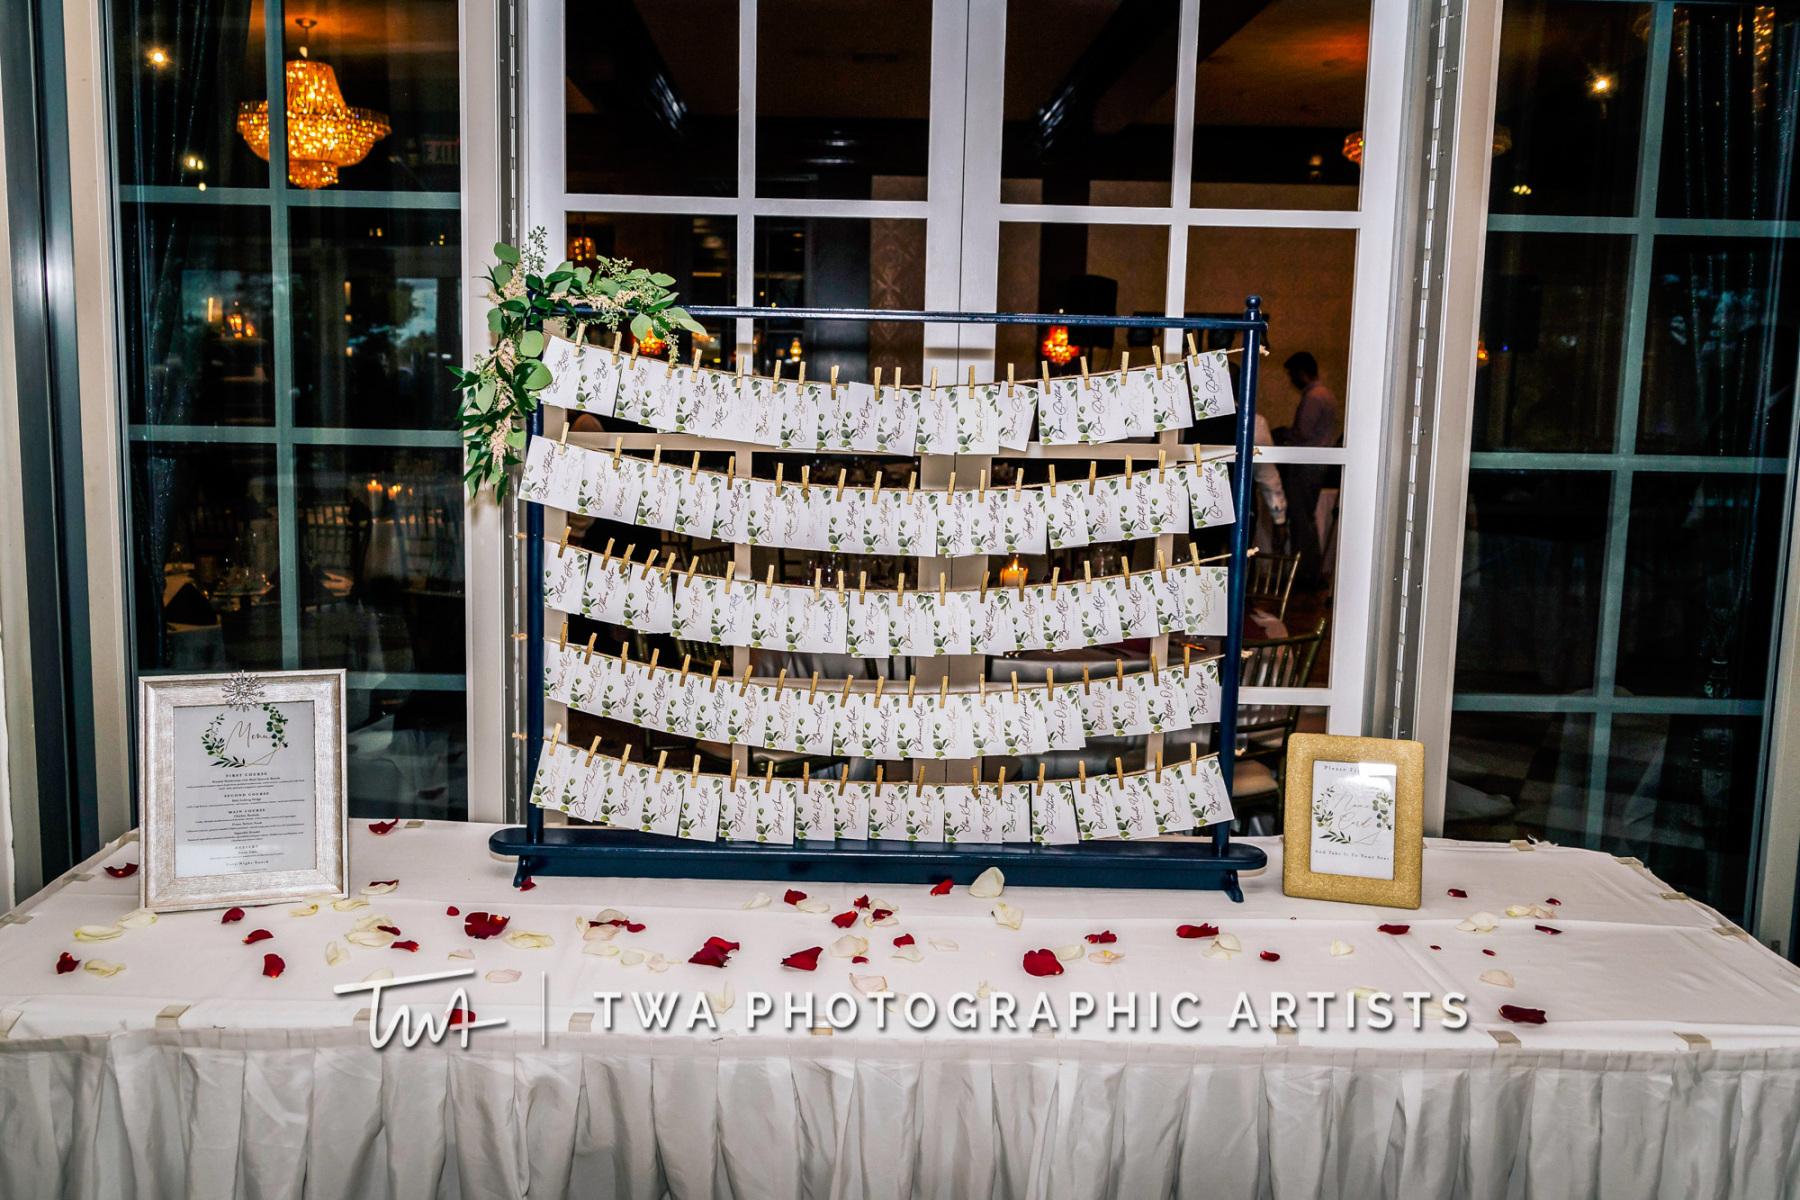 Chicago-Wedding-Photographer-TWA-Photographic-Artists-049_078-1160